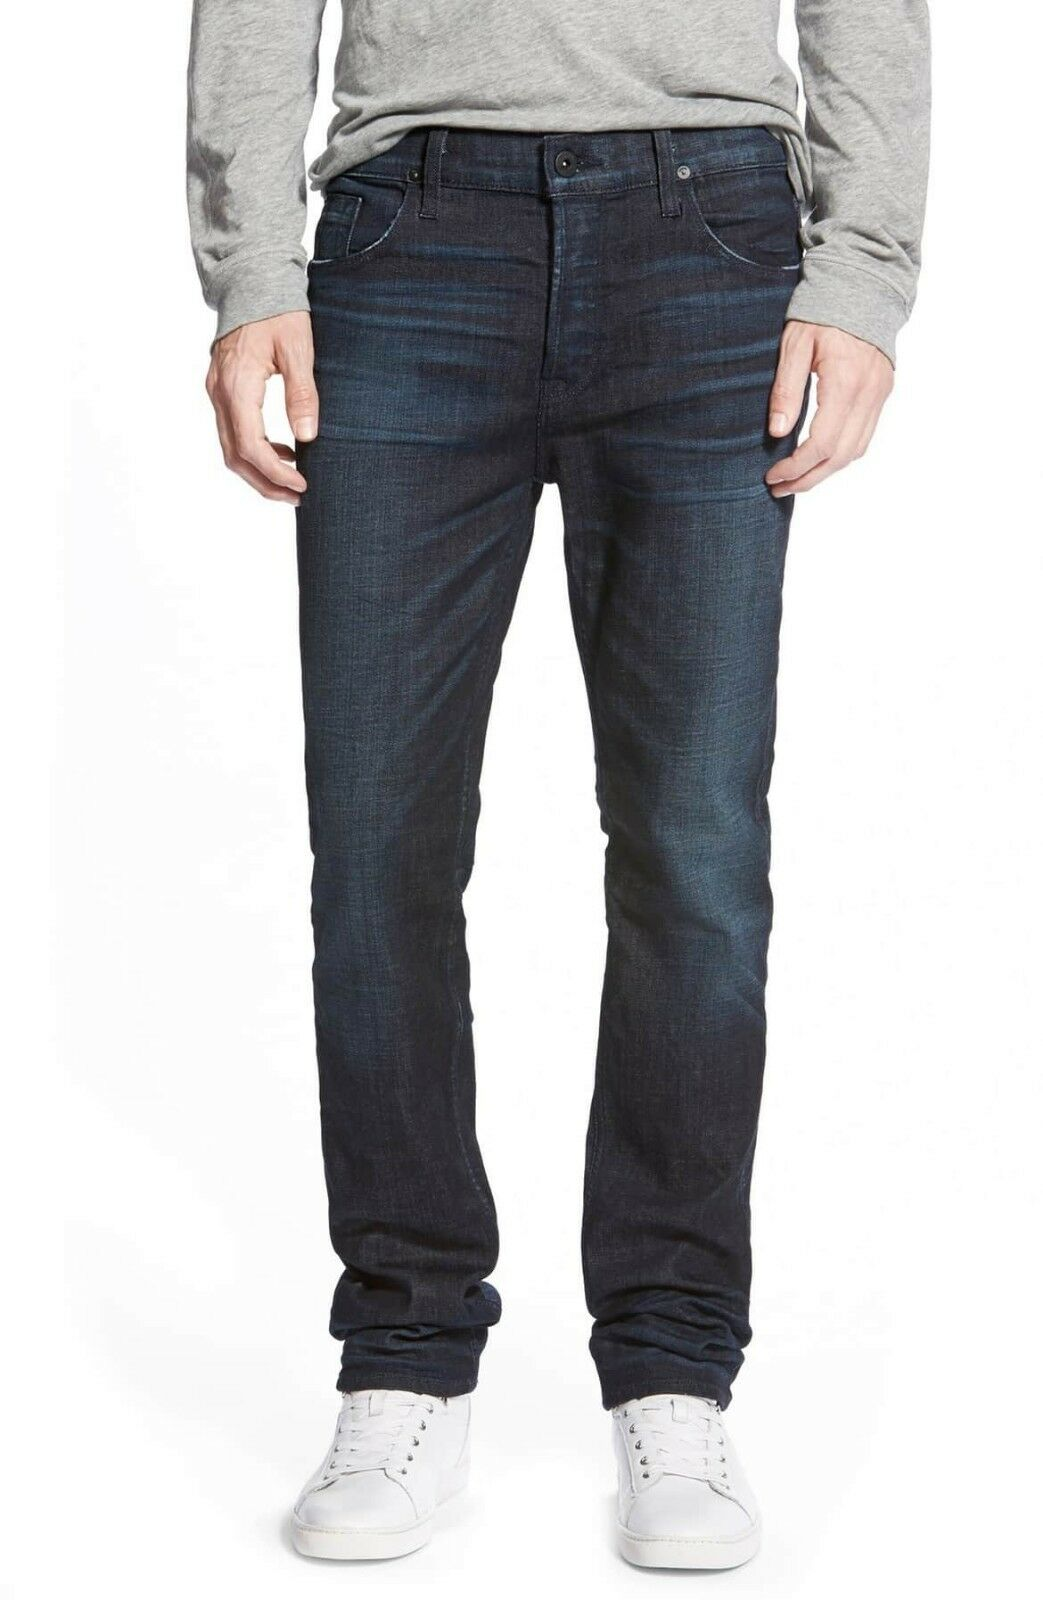 Hudson men's Sartor Slouchy Skinny Jean wash peacekeeper indigo bluee size  32